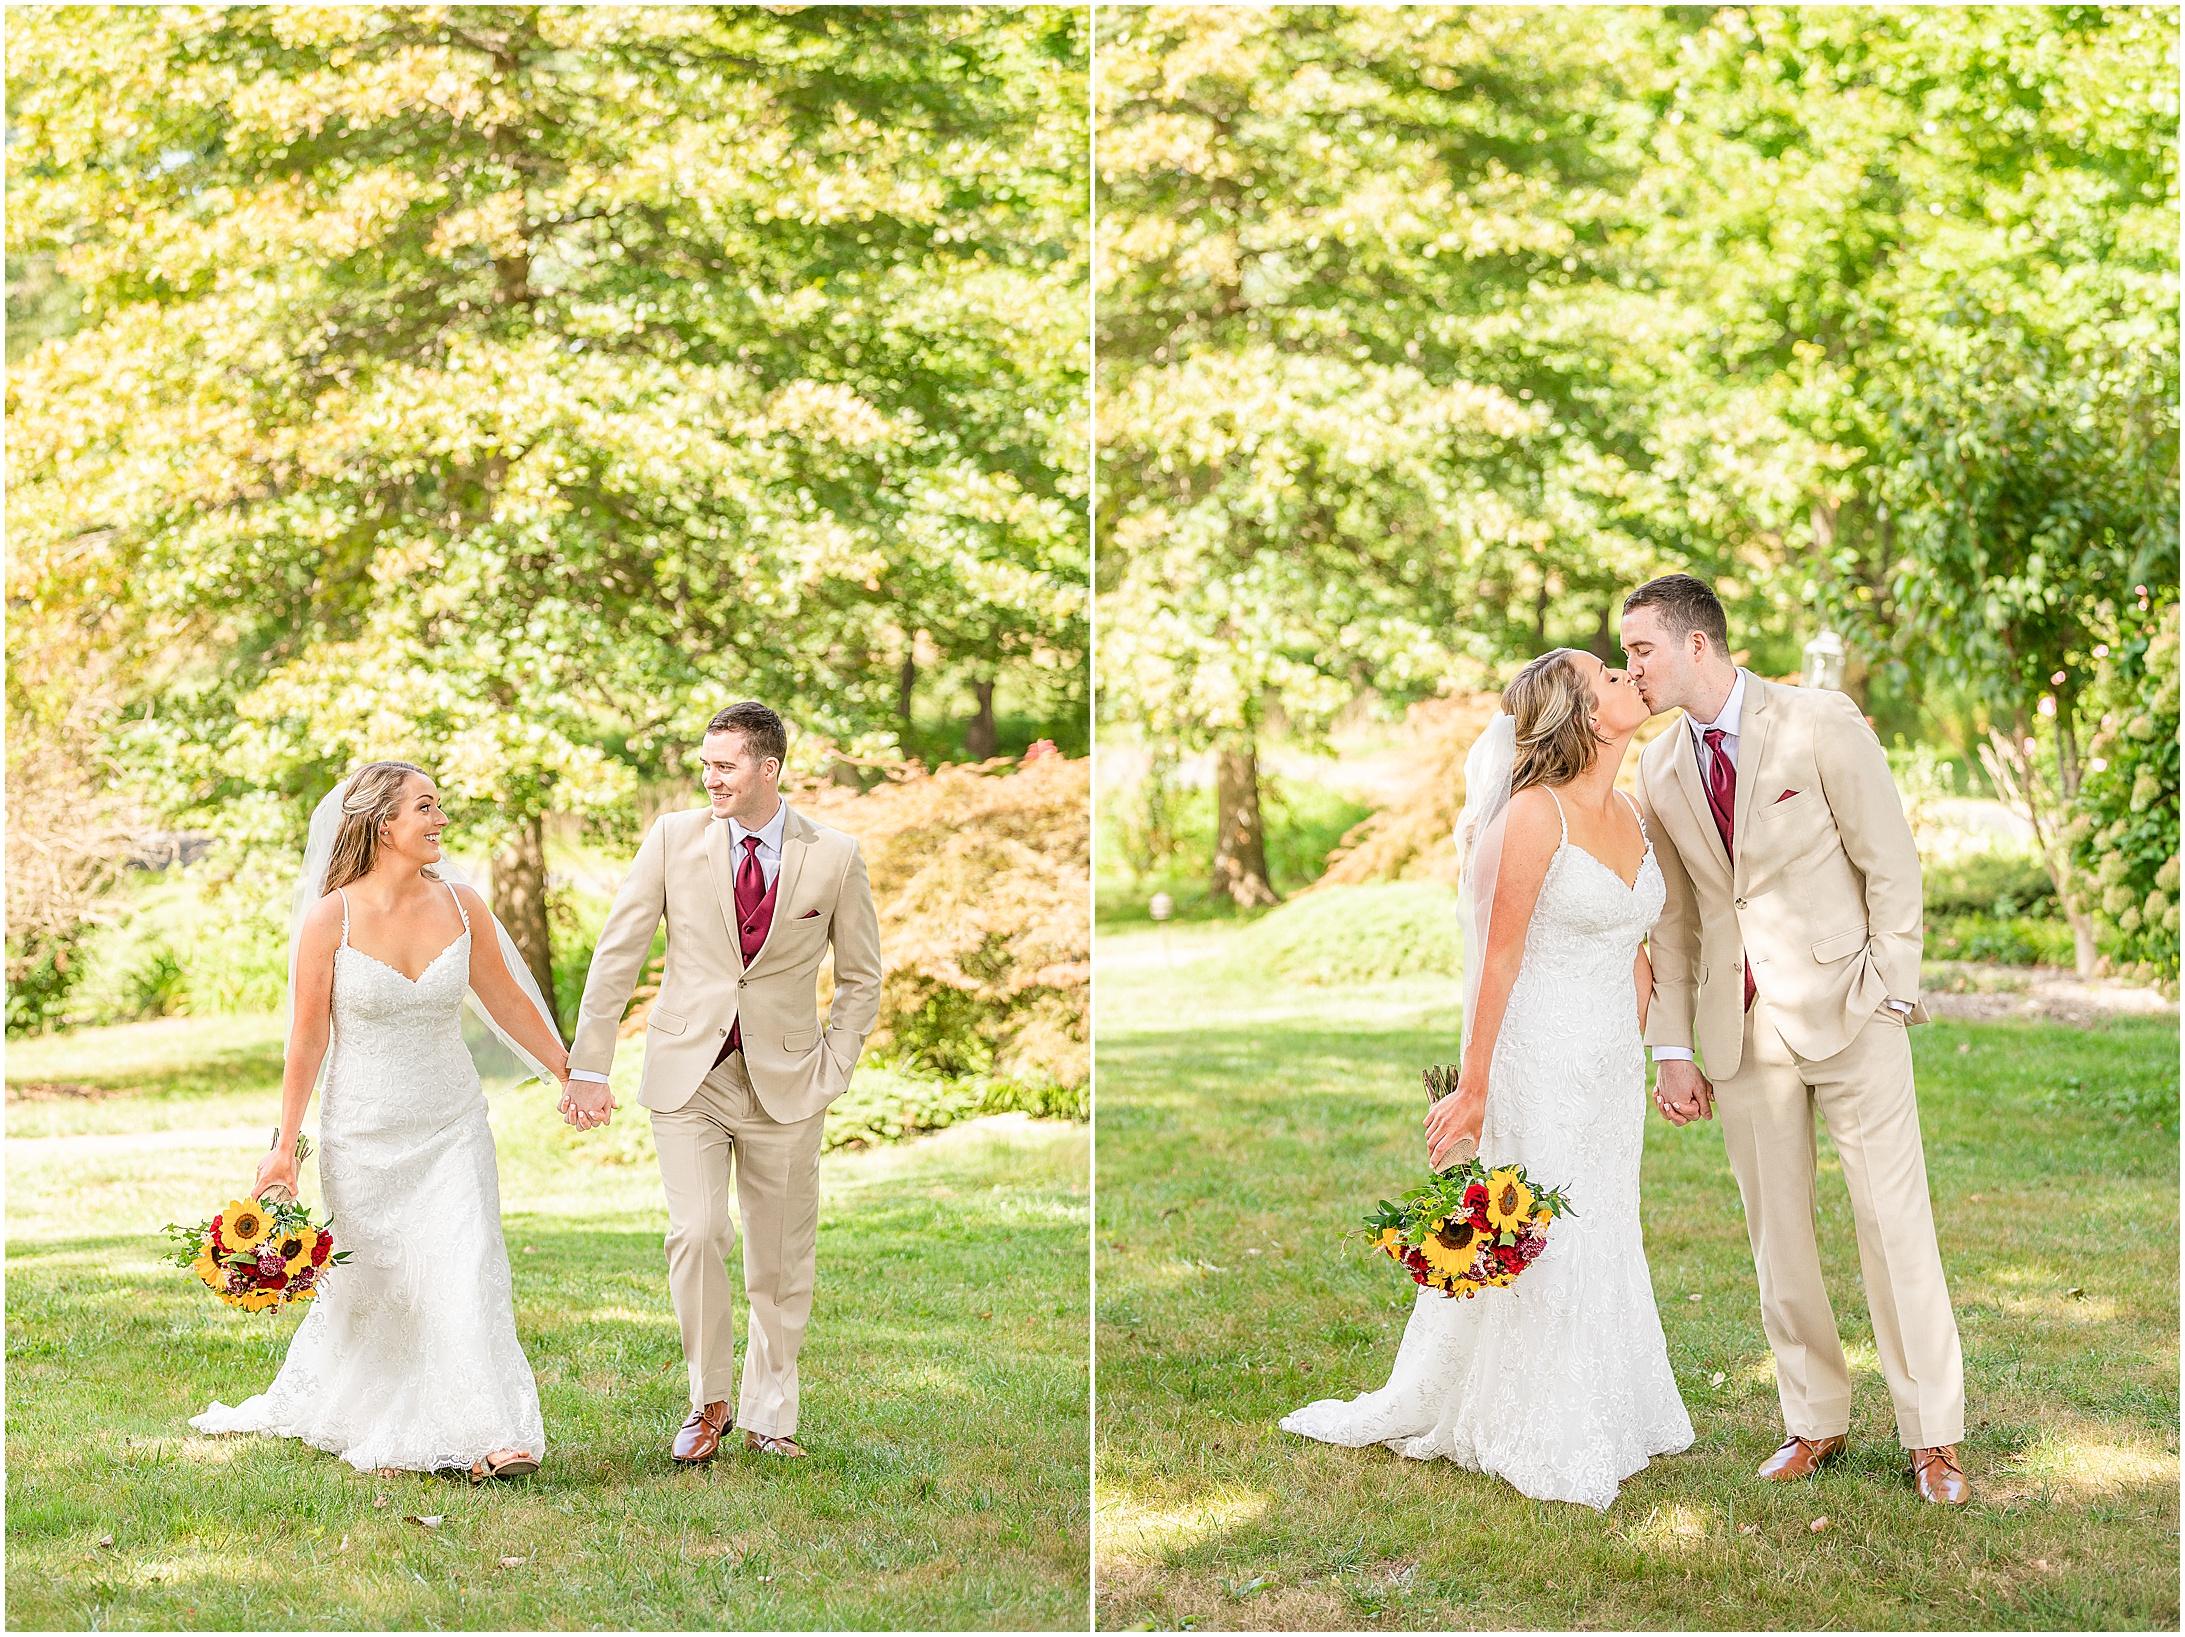 Christian-Royer-House-Wedding-Photos_0541.jpg